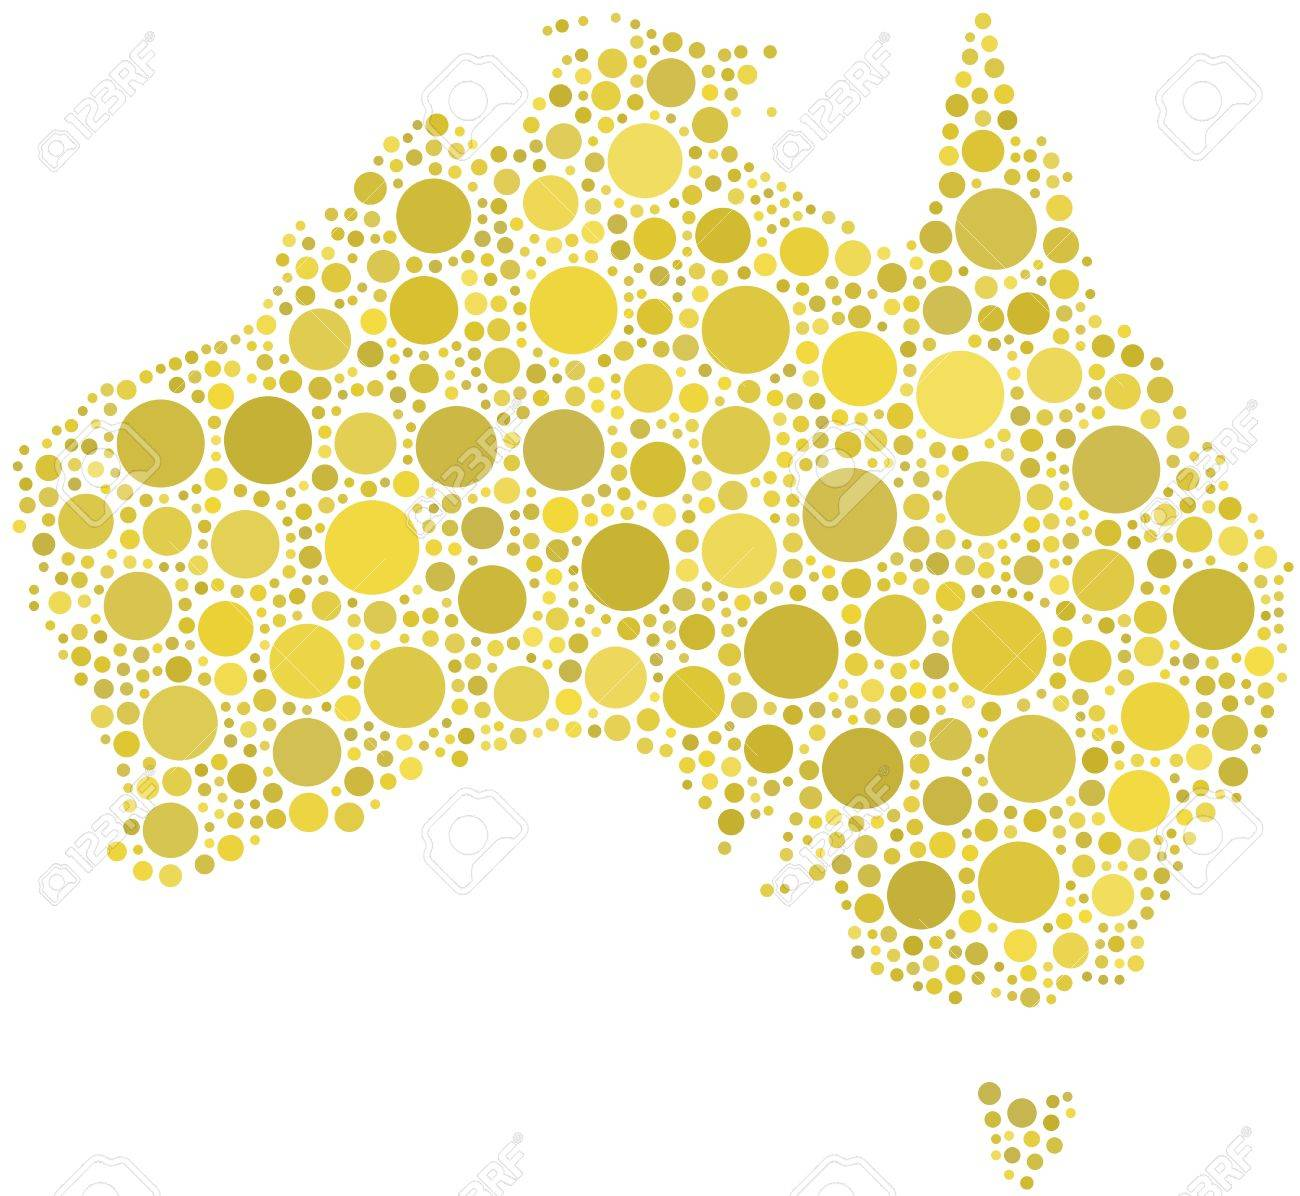 Map of Australia Stock Vector - 6761964